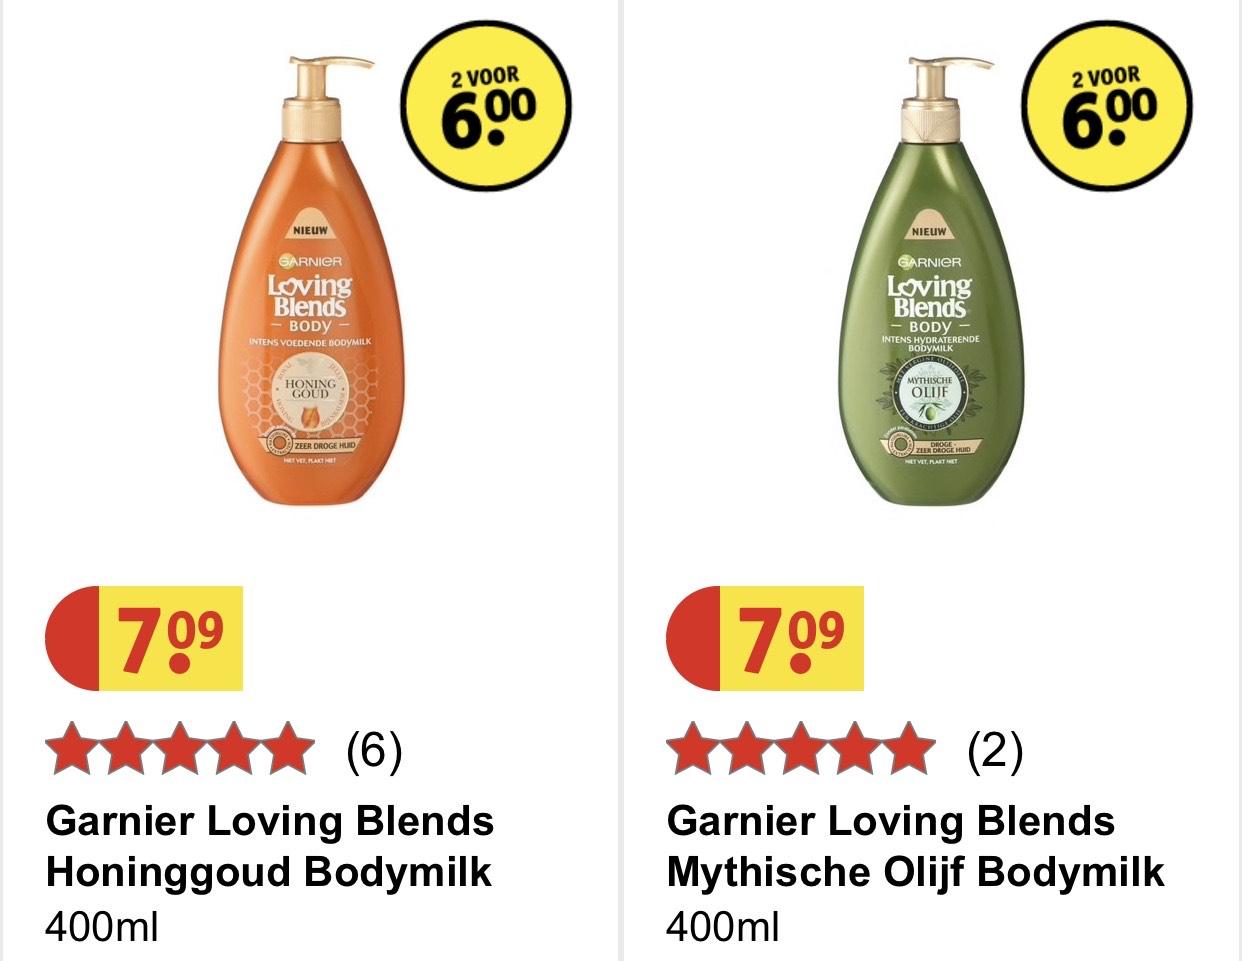 Garnier Loving Blends Bodymilk 2 voor €6 (ipv €14,18) + GRATIS Bolsius Geurkaars t.w.v. €2,99 @ Kruidvat